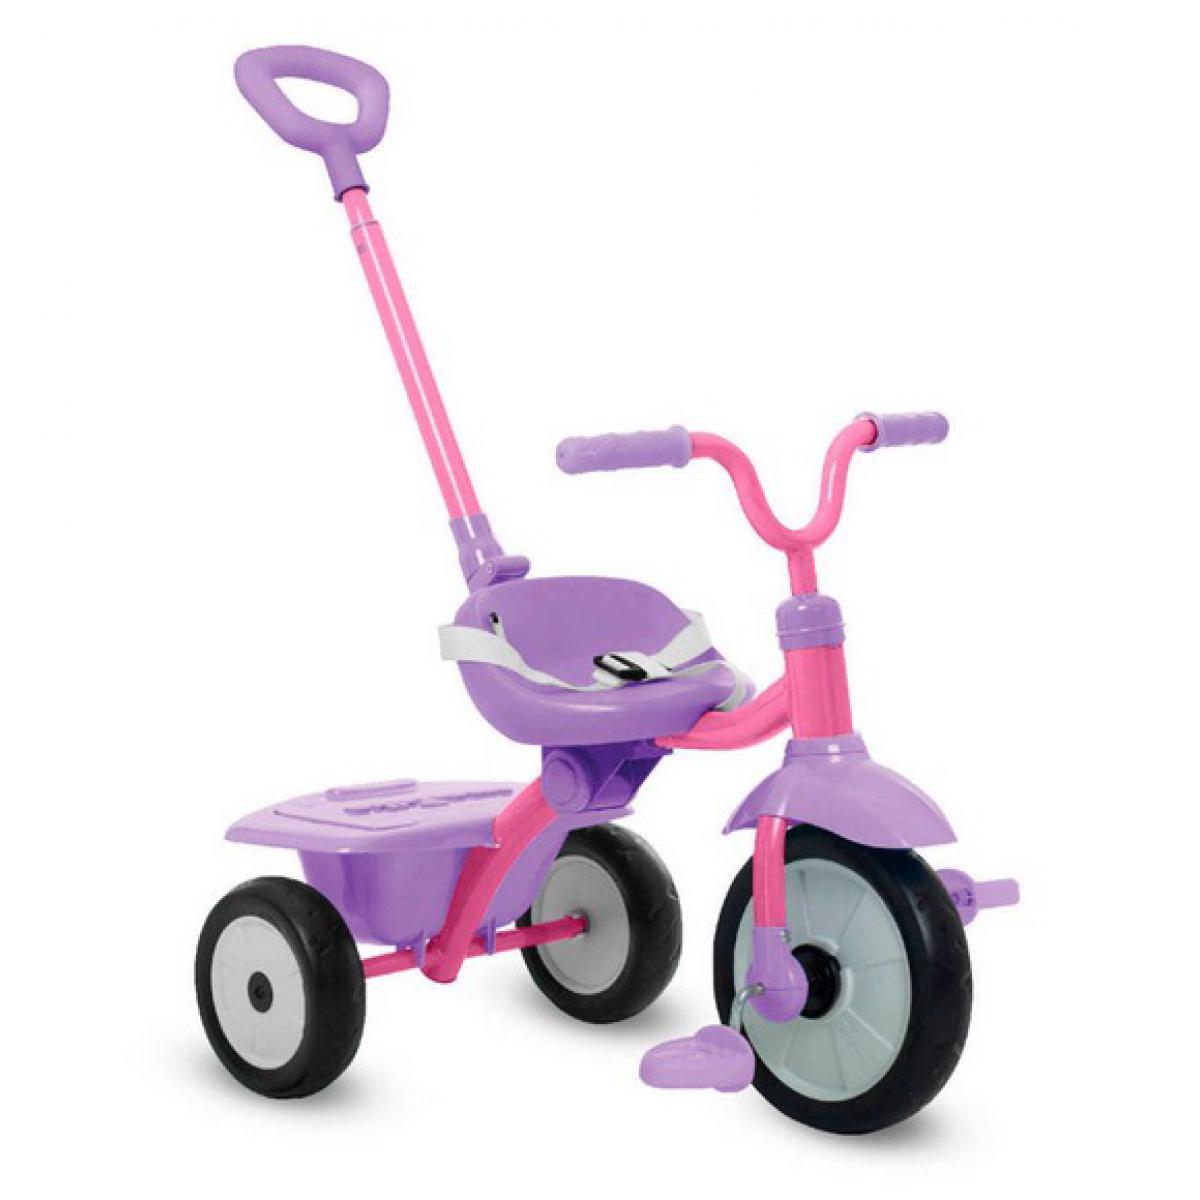 Smart Trike Smartrike Tricycle Pliable Folding Fun Rose